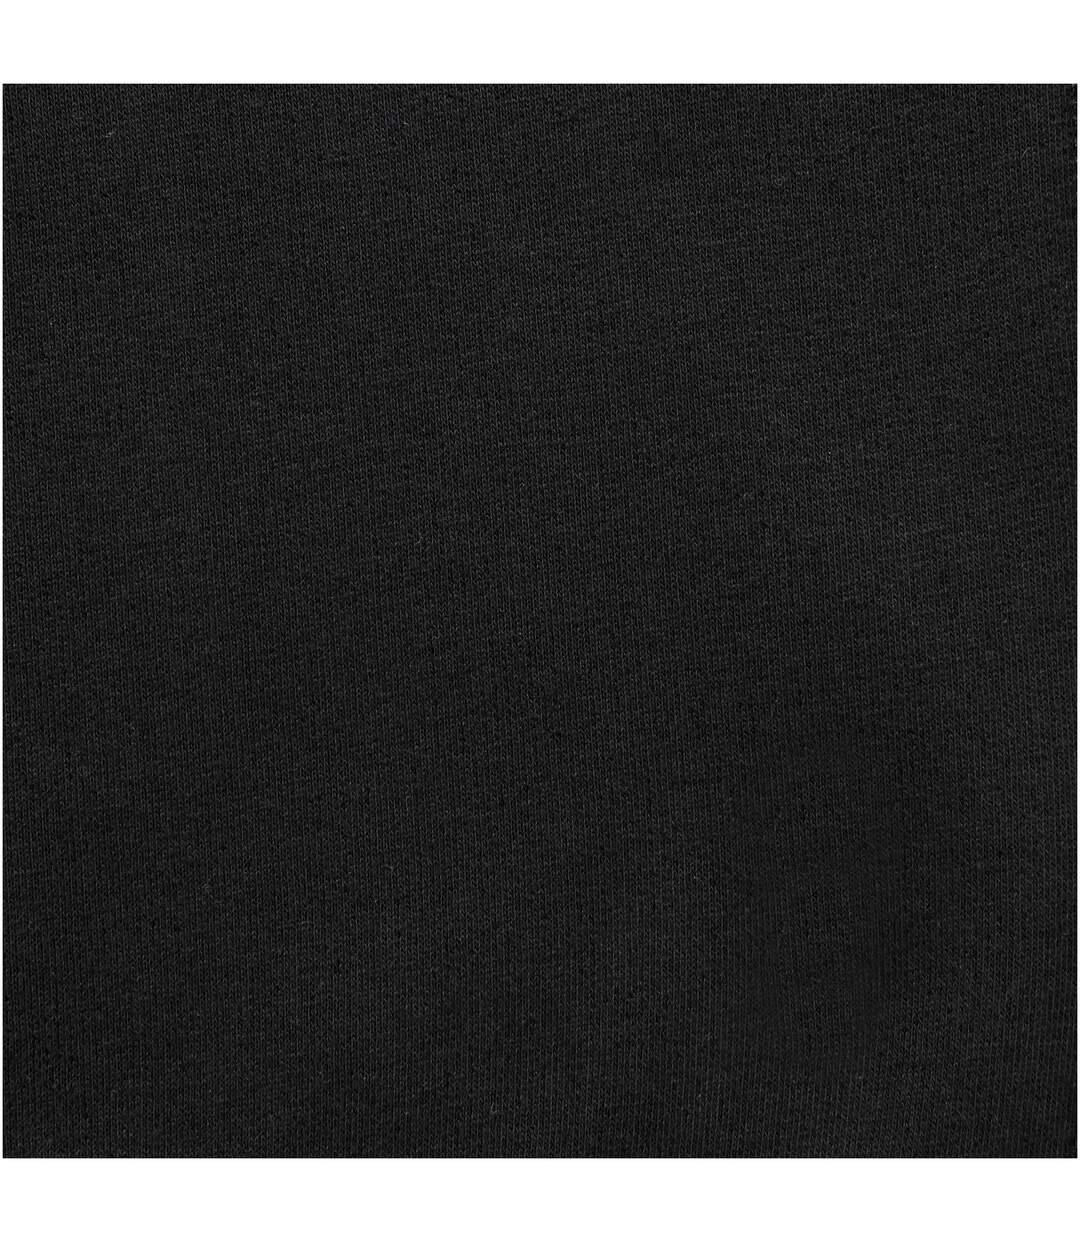 Elevate Mens Arora Hooded Full Zip Sweater (Solid Black) - UTPF1850